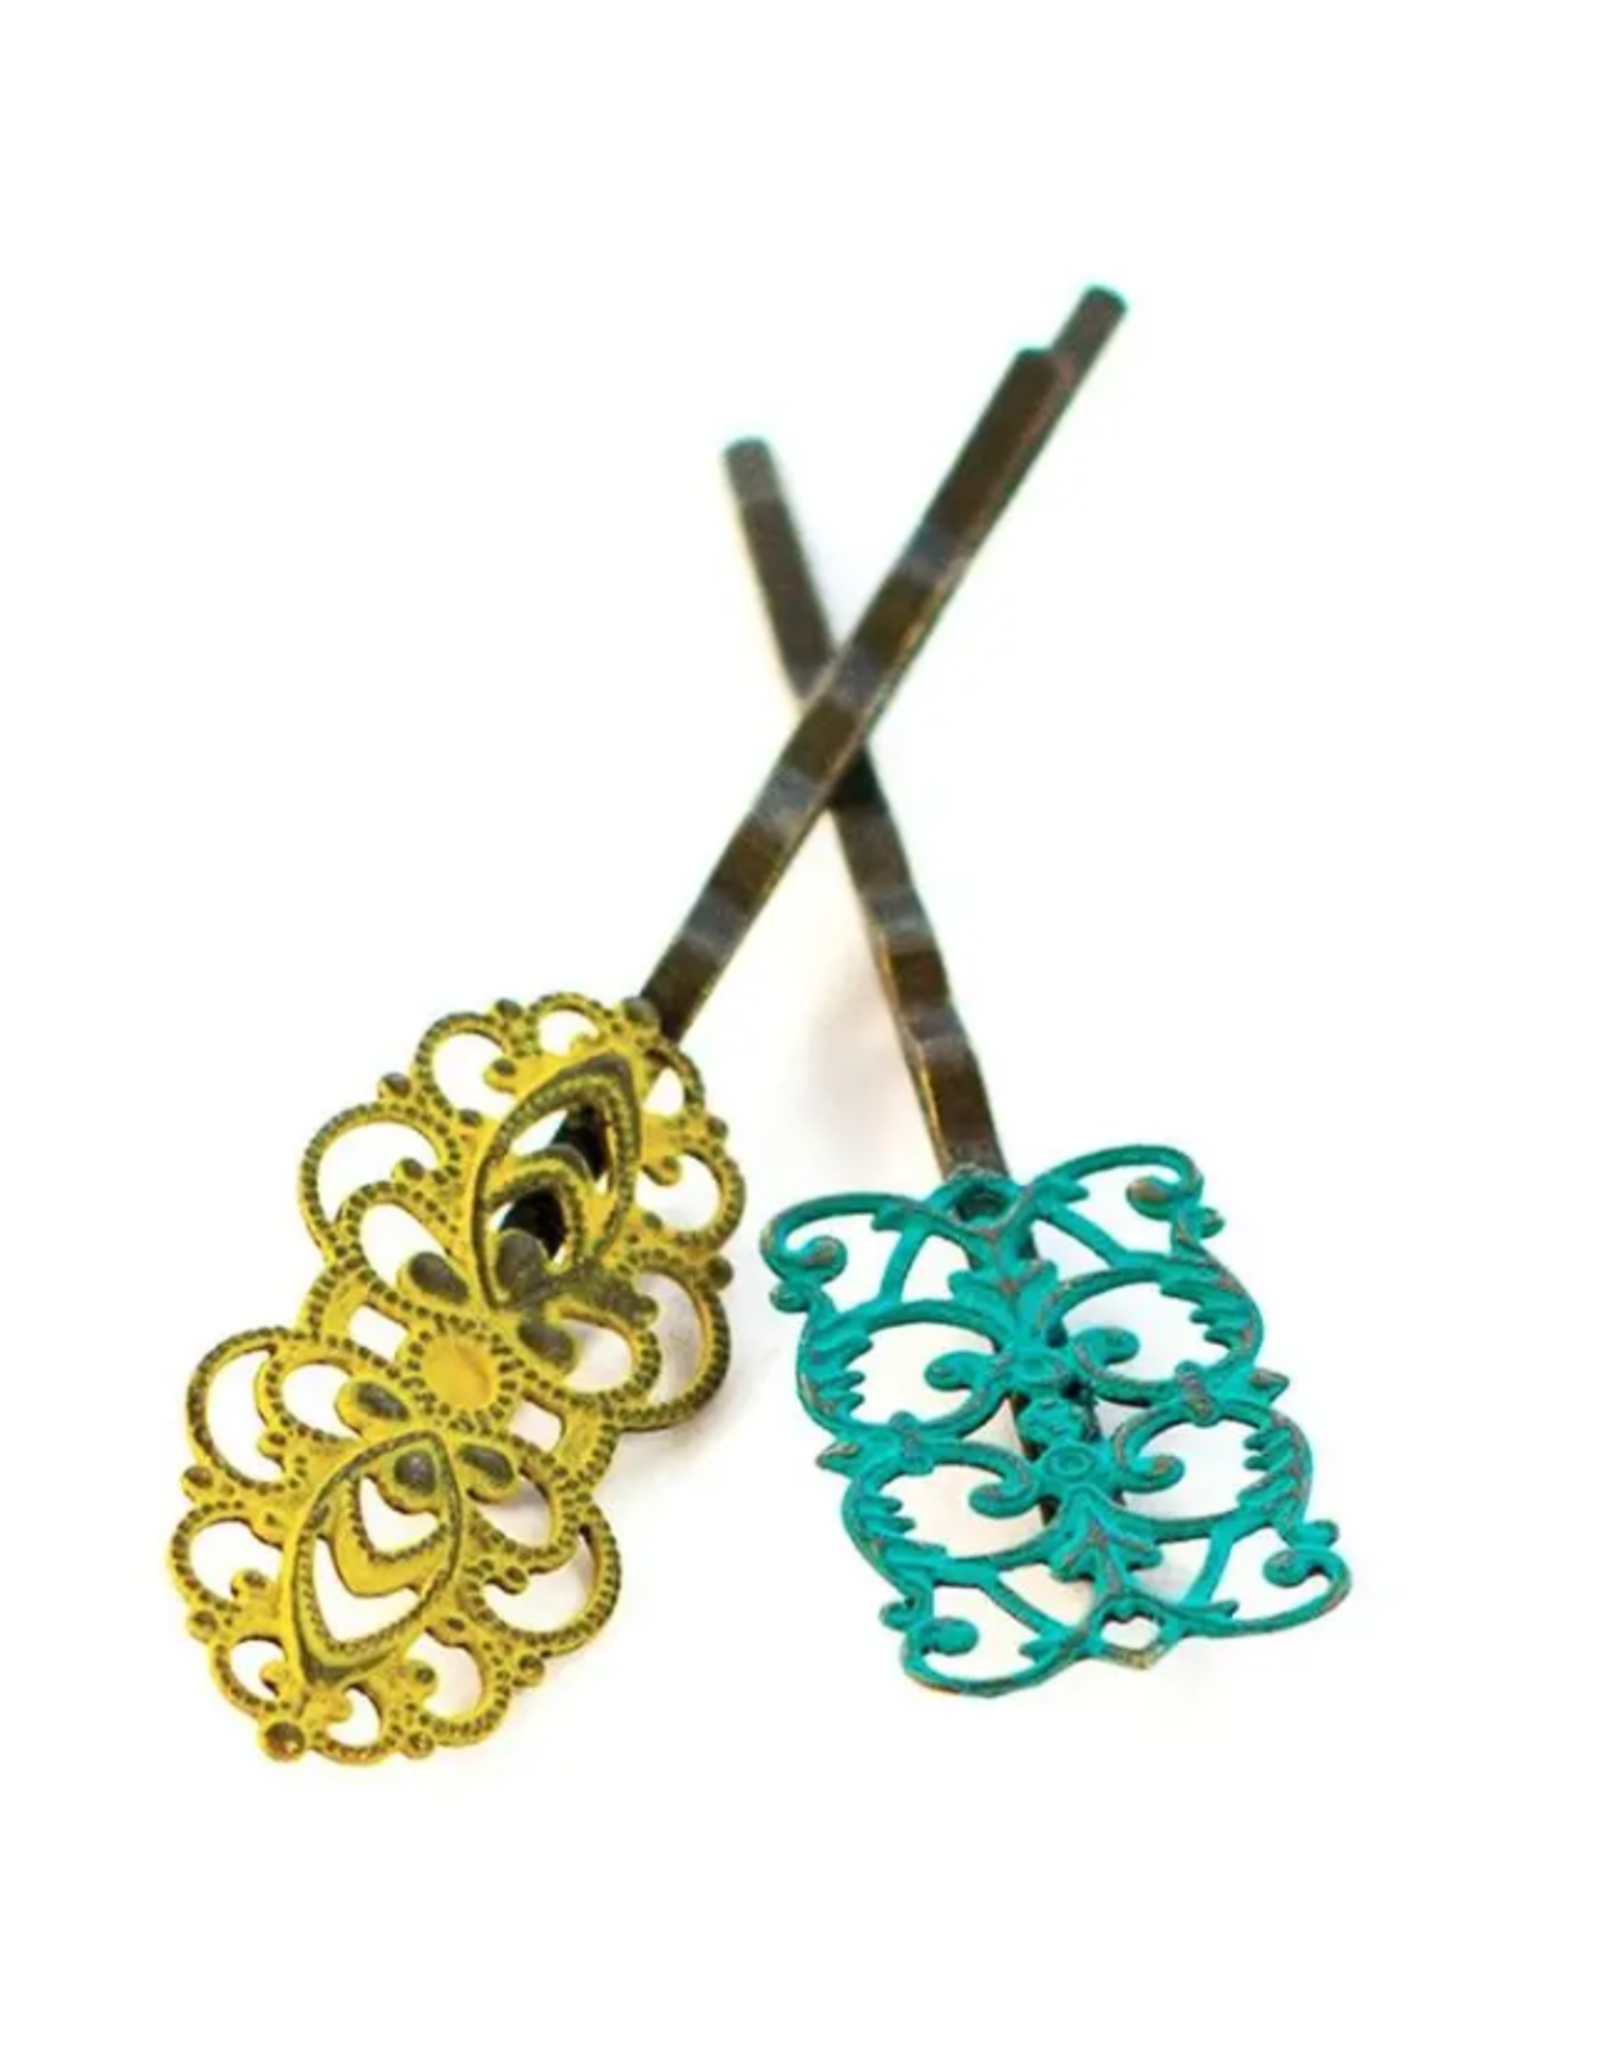 Gleeful Peacock Dainty bobby pins (Citron & Teal)